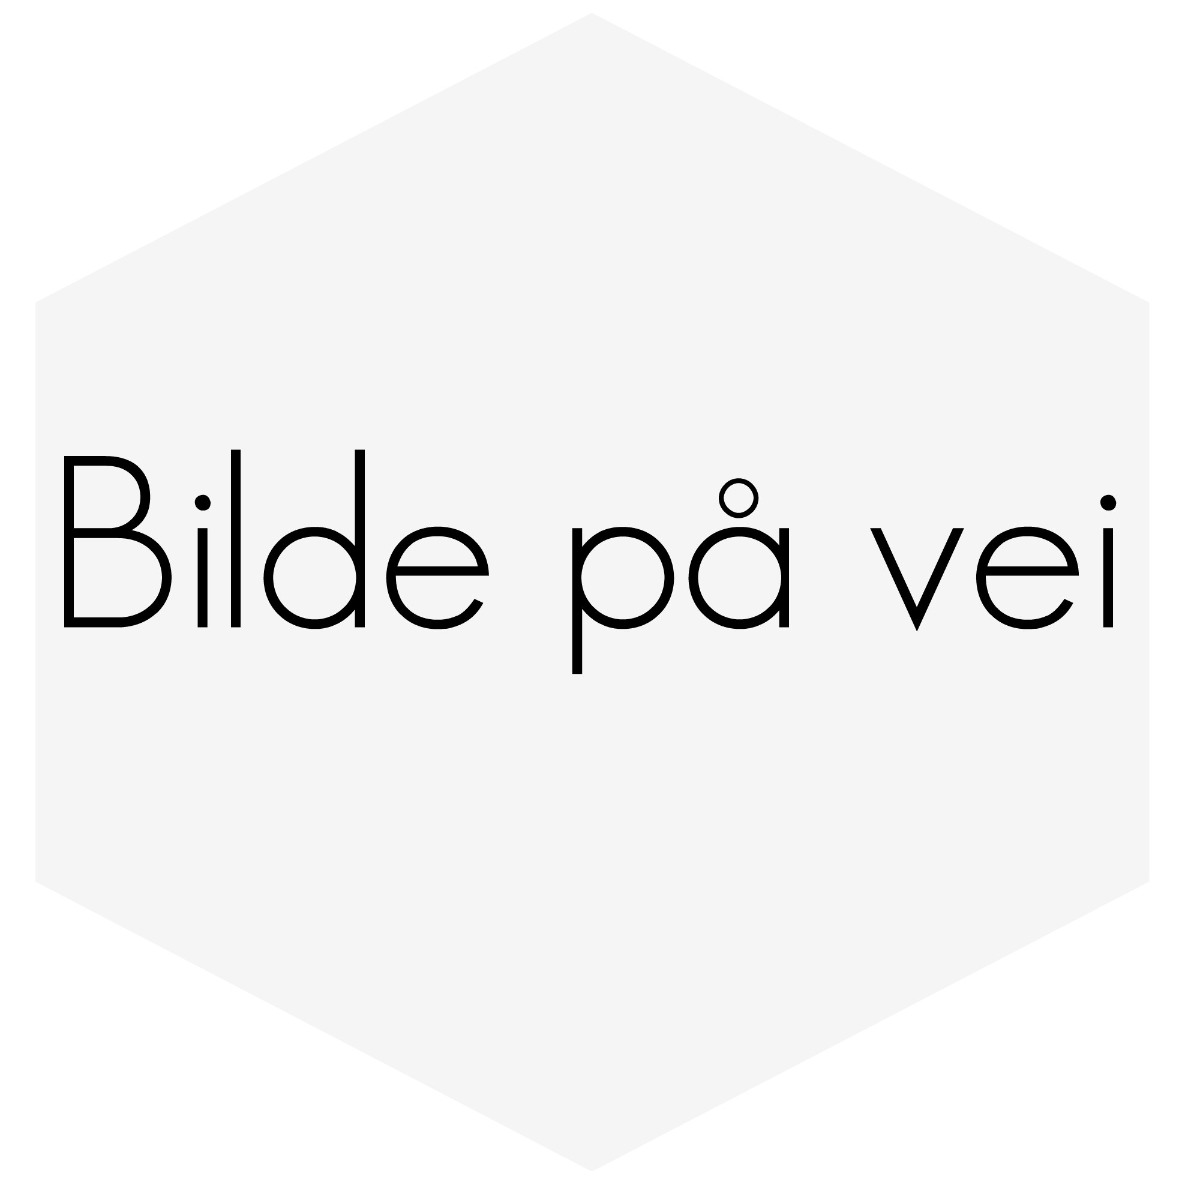 LUFTINNTAK SLANGE VOLVO C30,S40,V50 05-07 D 30773743